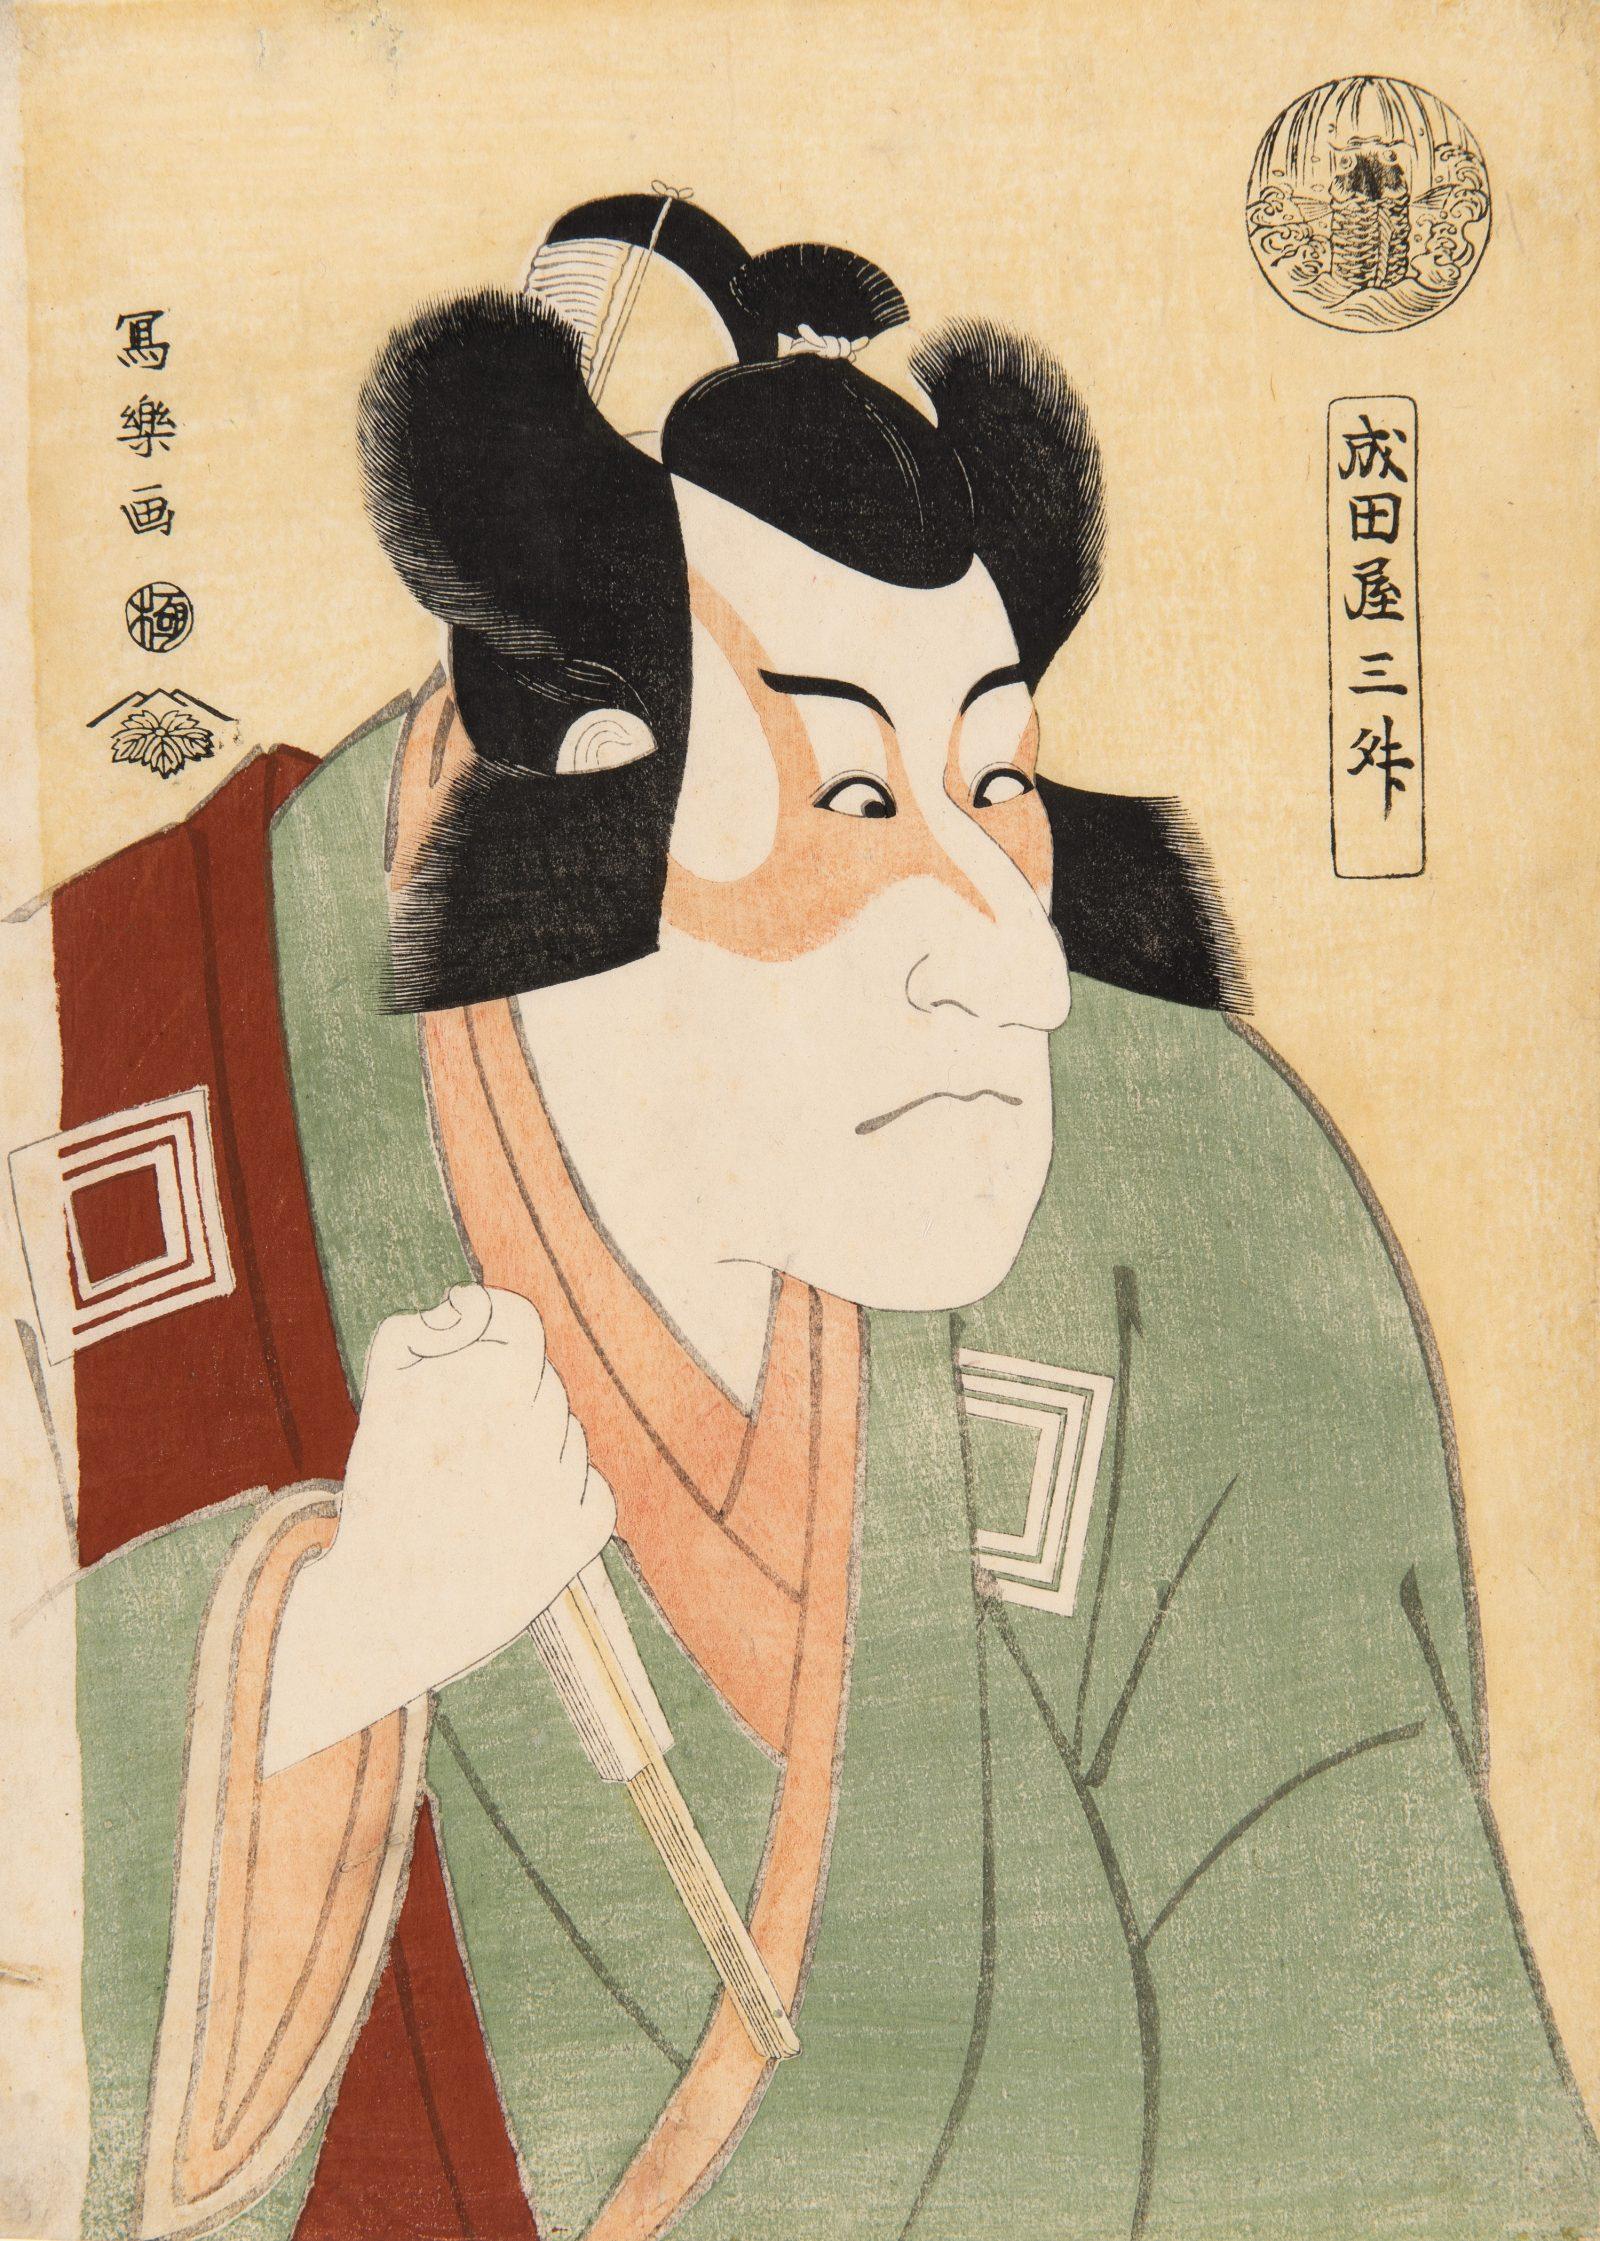 TŌSHŪSAI SHARAKU (active 1794 – 95) Ichikawa Danjūrō VI as Arakawa Tarō Takesada , 11/1794 . Color woodblock print, 13 x 9¼ in ches. Image courtesy of Gibbes Museum of Art